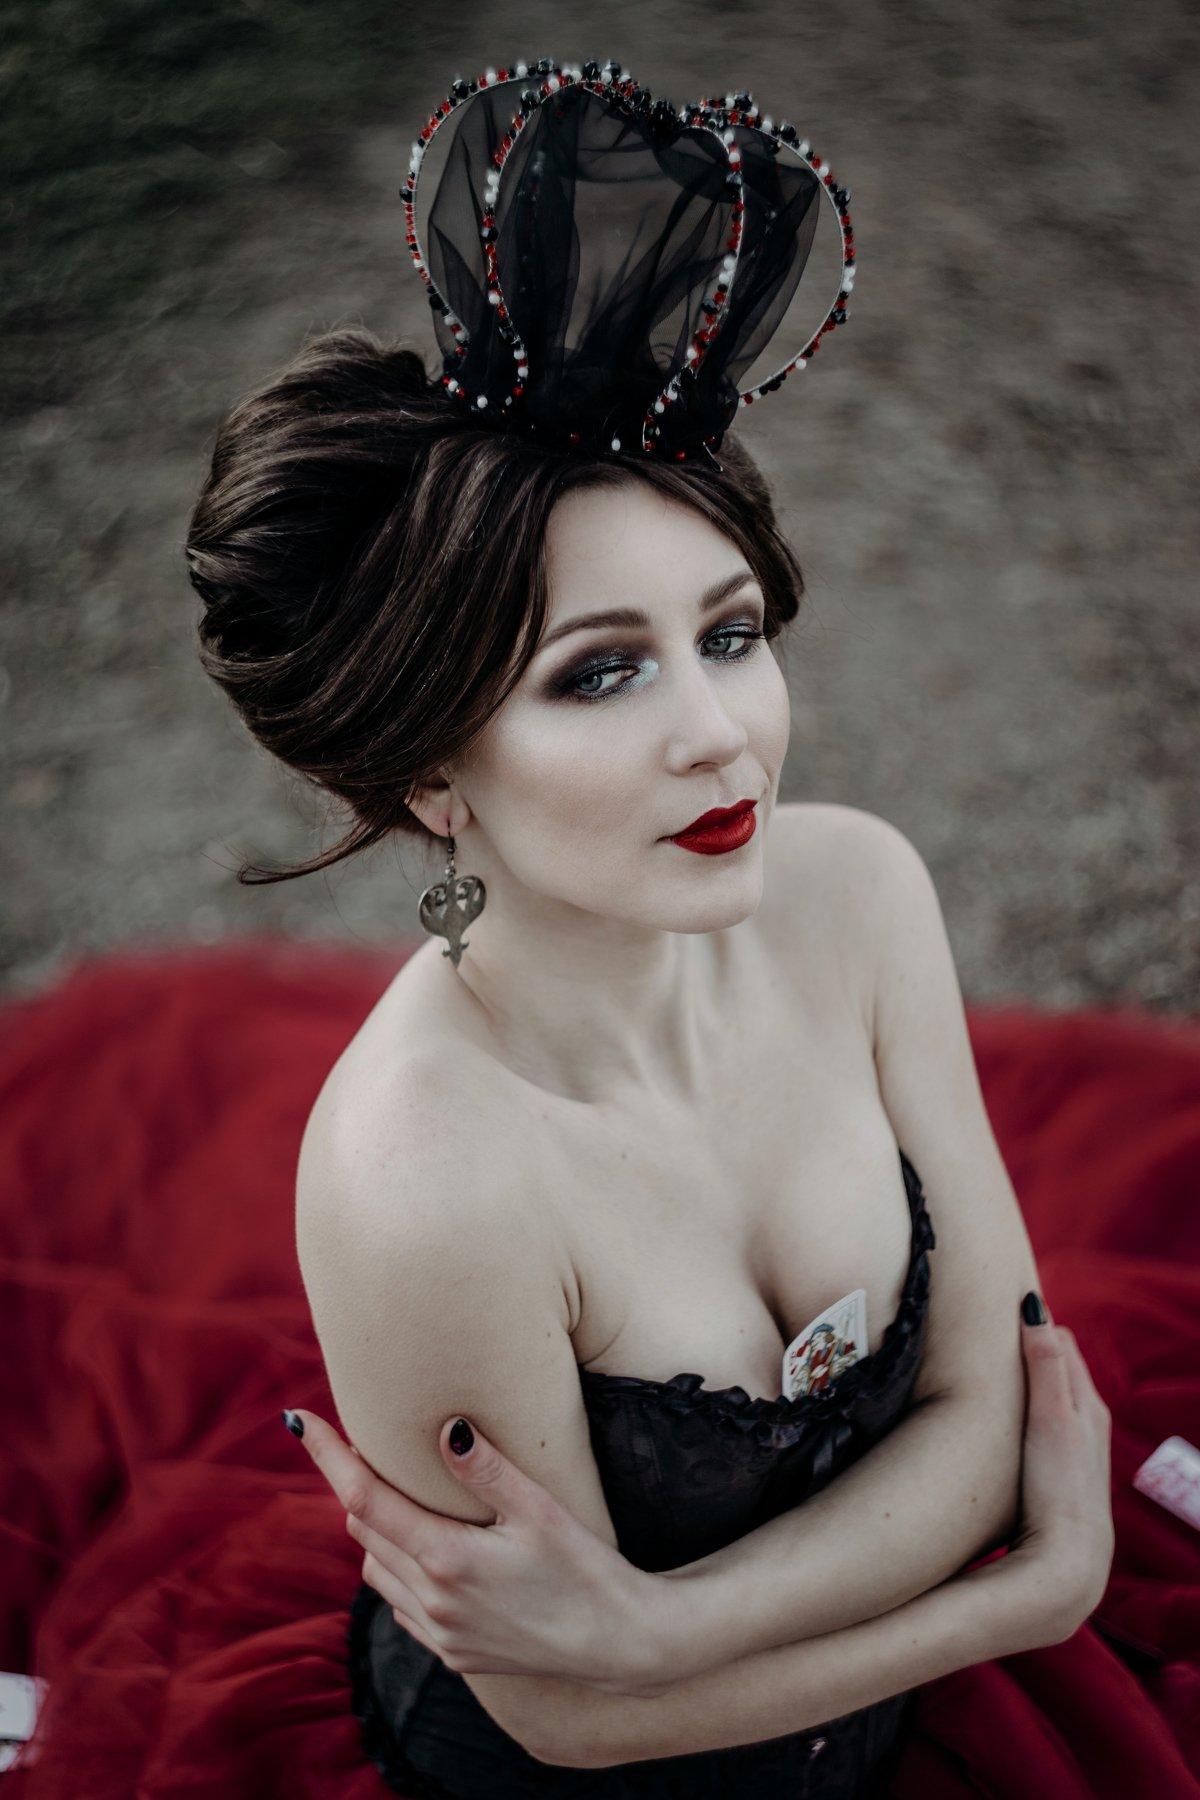 queen portrait girl, Agafonova Mila